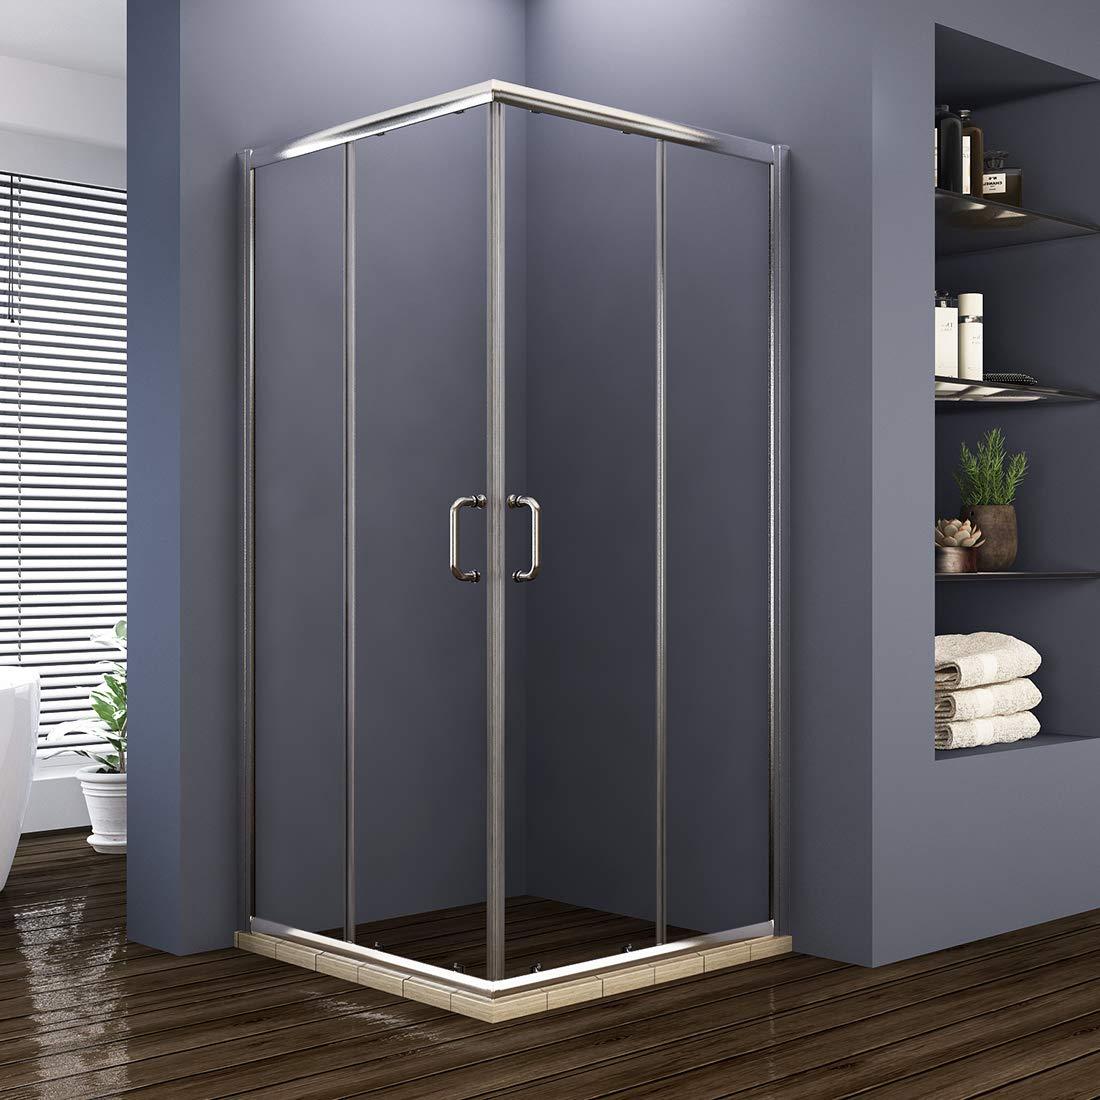 "Elegant Showers 36"" x 36"" x 72"" Kit"